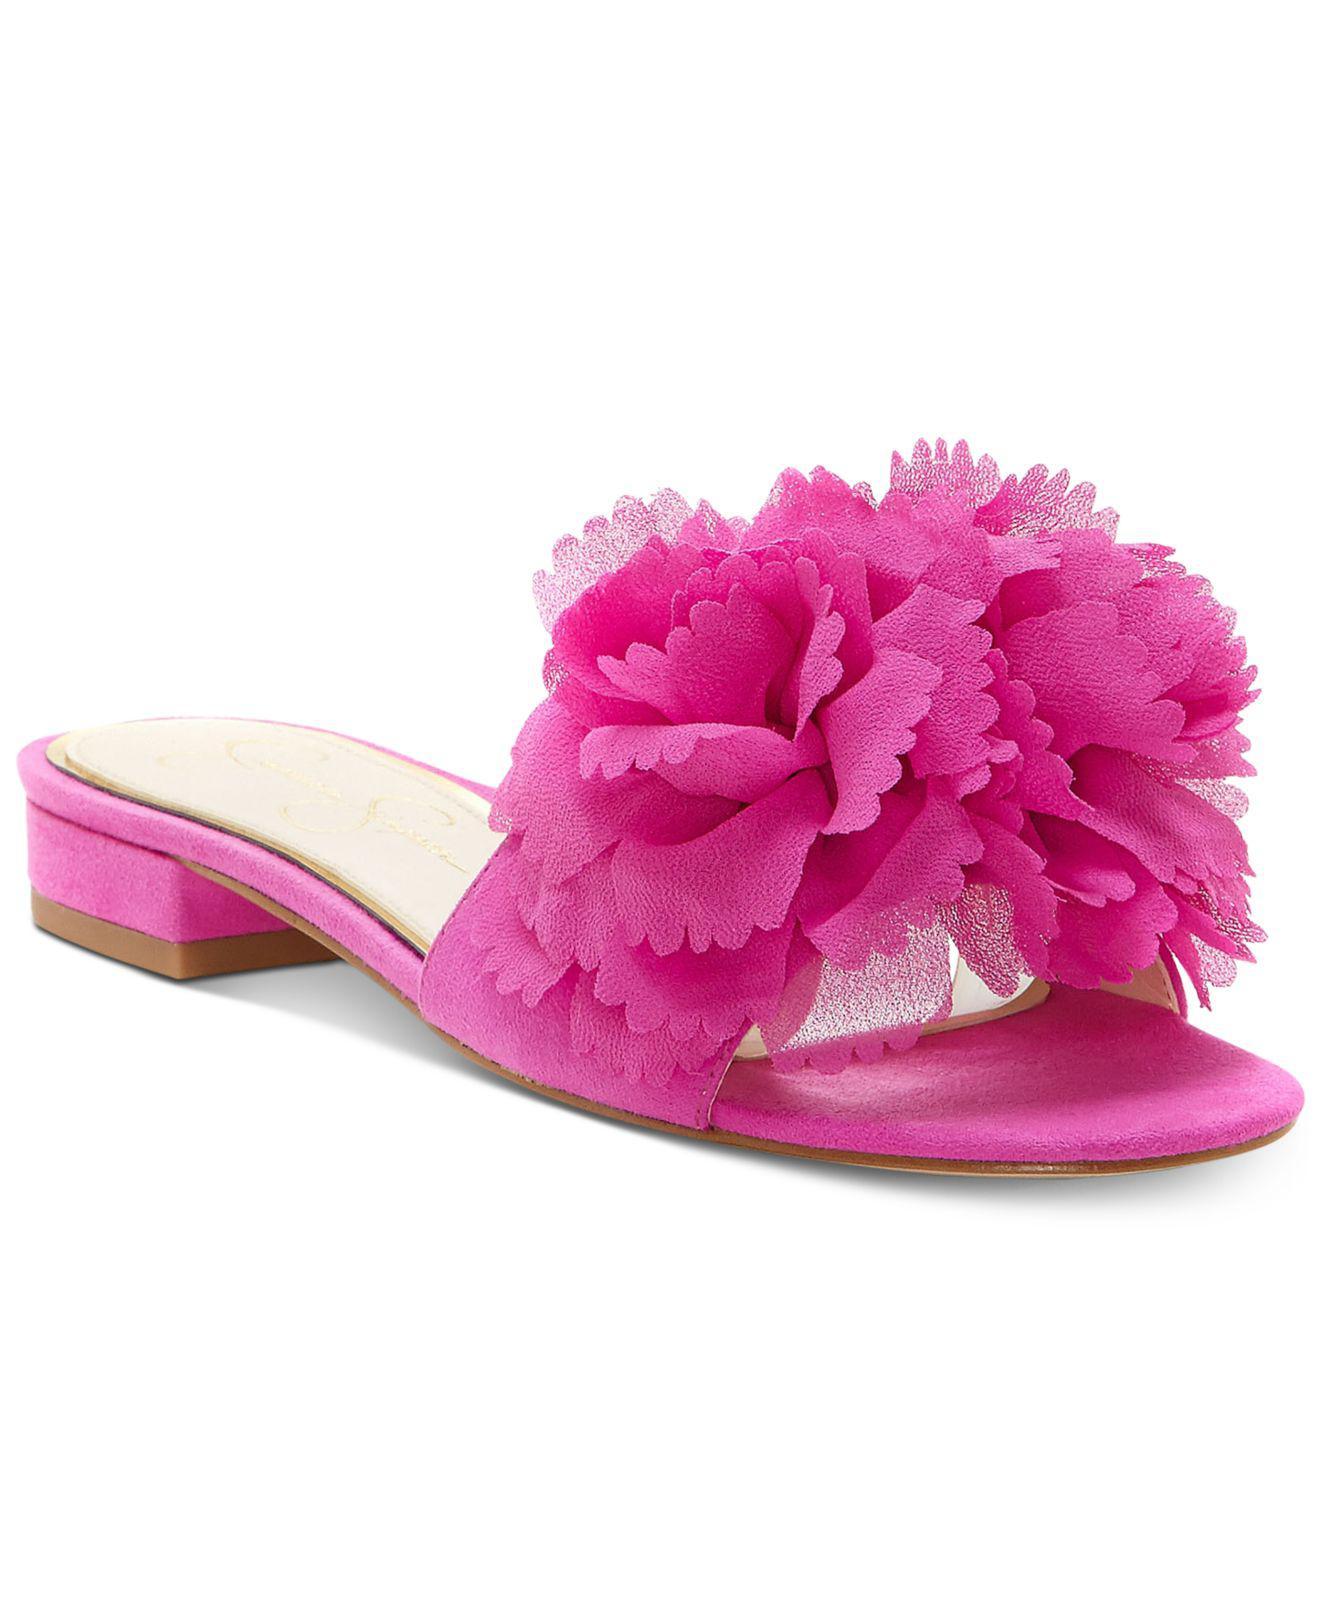 Jessica SimpsonCARALIN - Mules - hot shot pink Idl3veSy5n